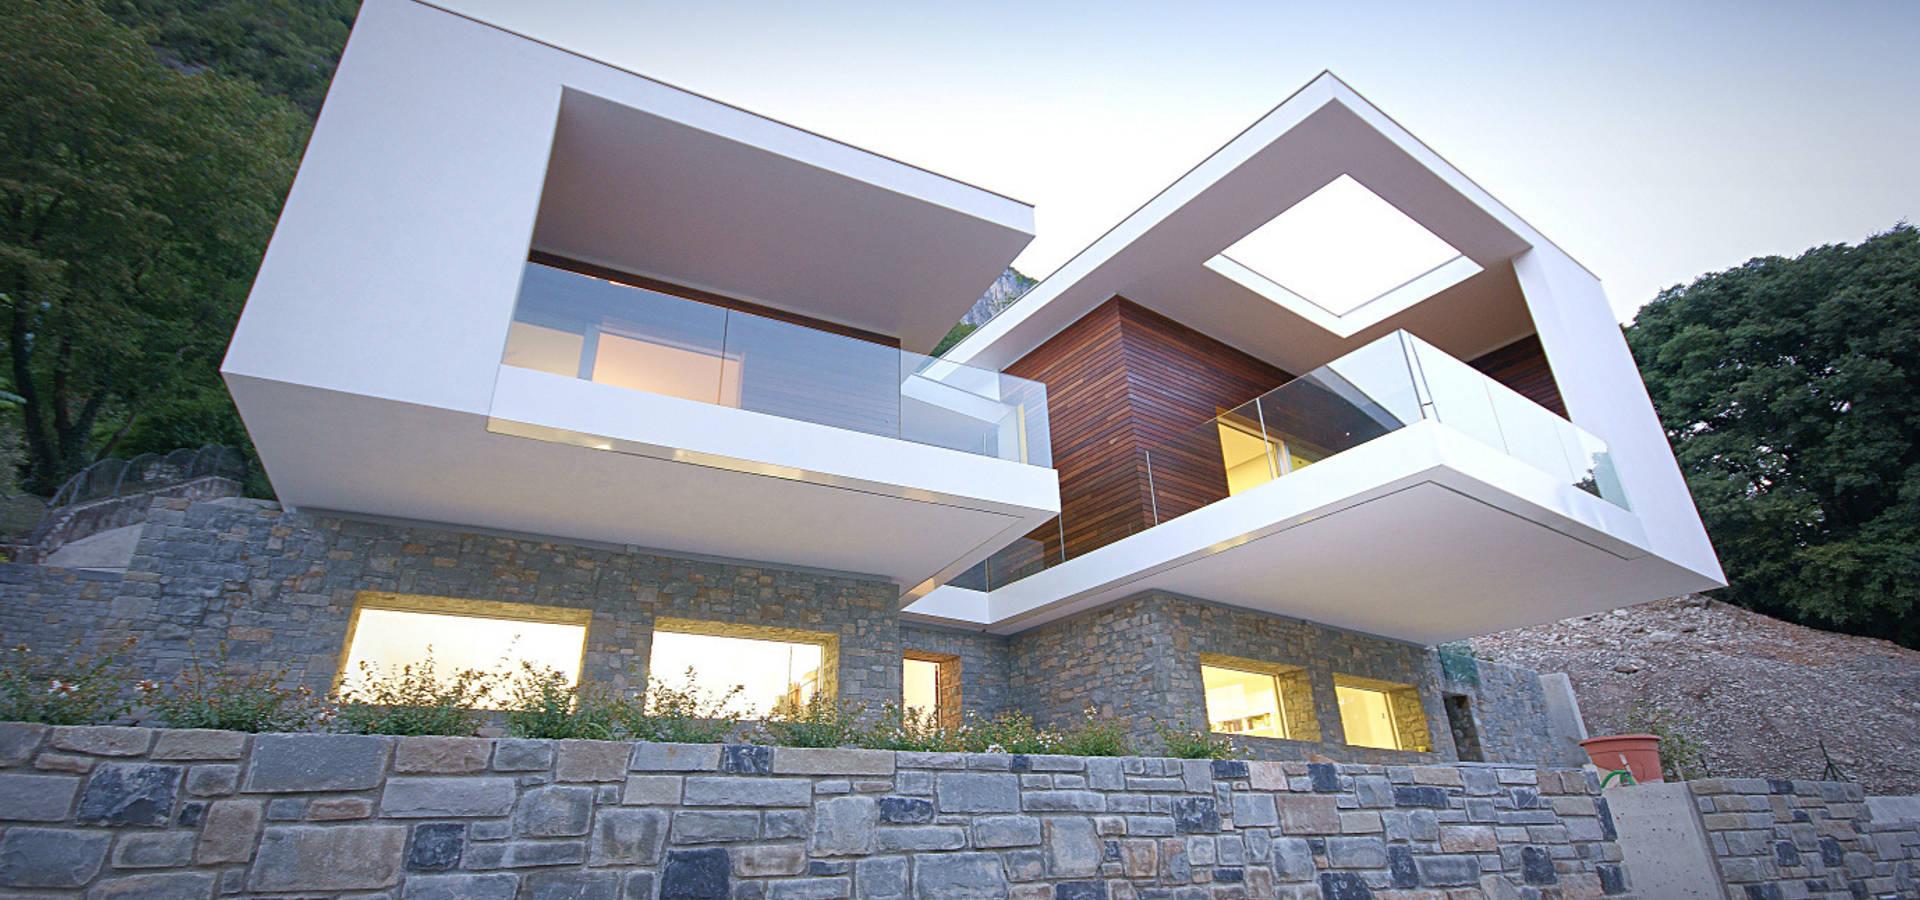 studio architettura massimo nodari architetti a esine bs